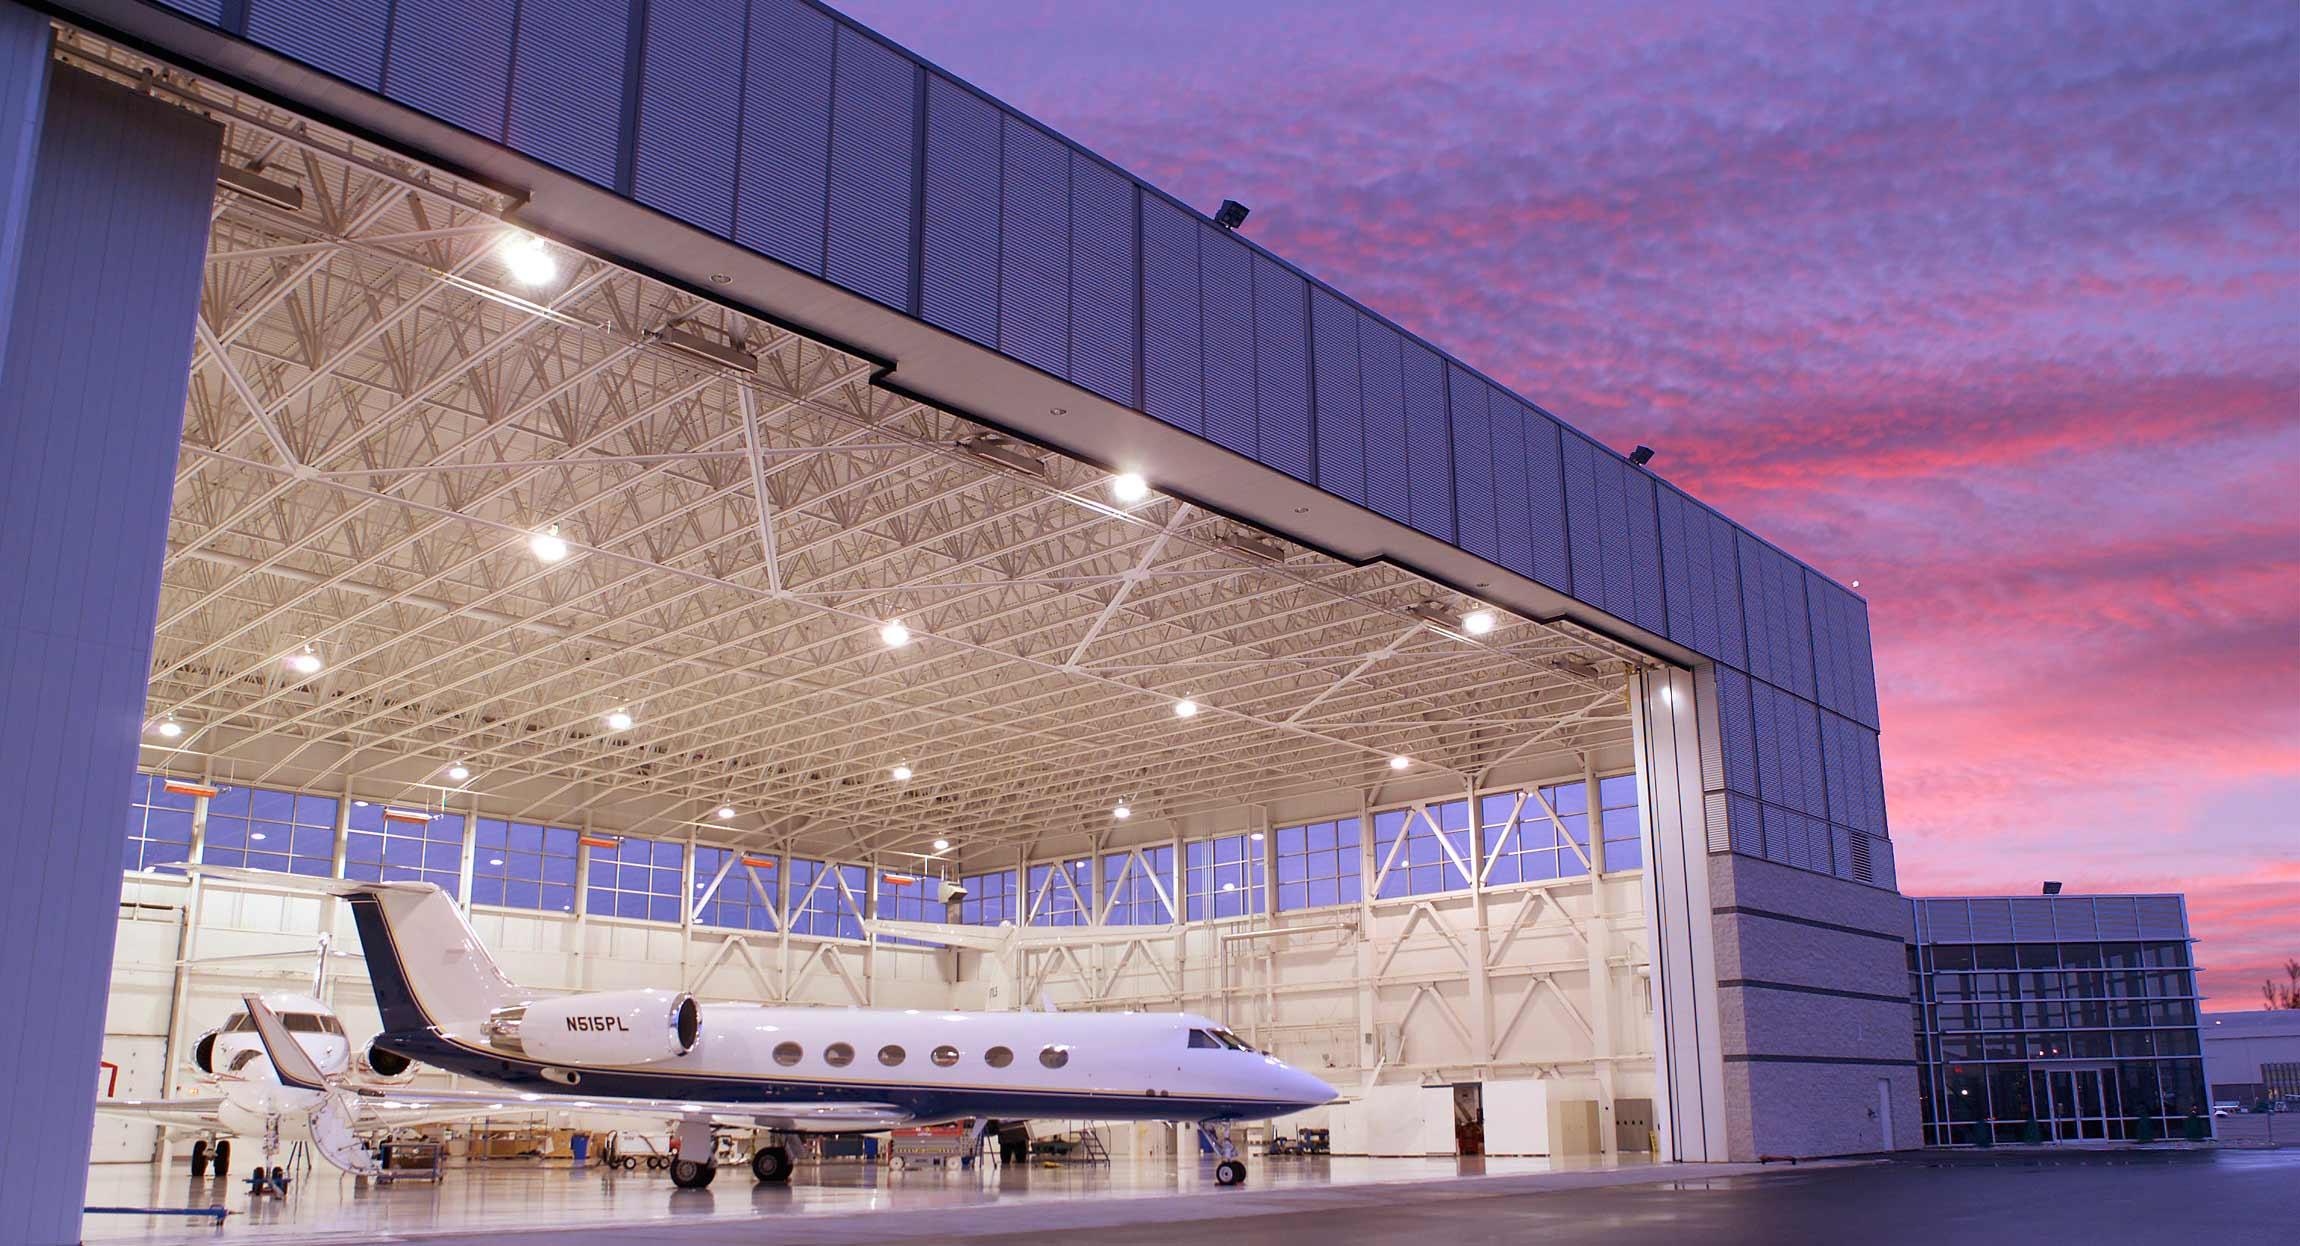 motorized airplanes with  on Cybird3CHRobotFlyingBirdElectricRCAirplane likewise  further Frank aviation video moreover Details in addition FMS800mmF4UCorsairV2MiniWarbirdsV24CH24GHzRTFRCAirplane.